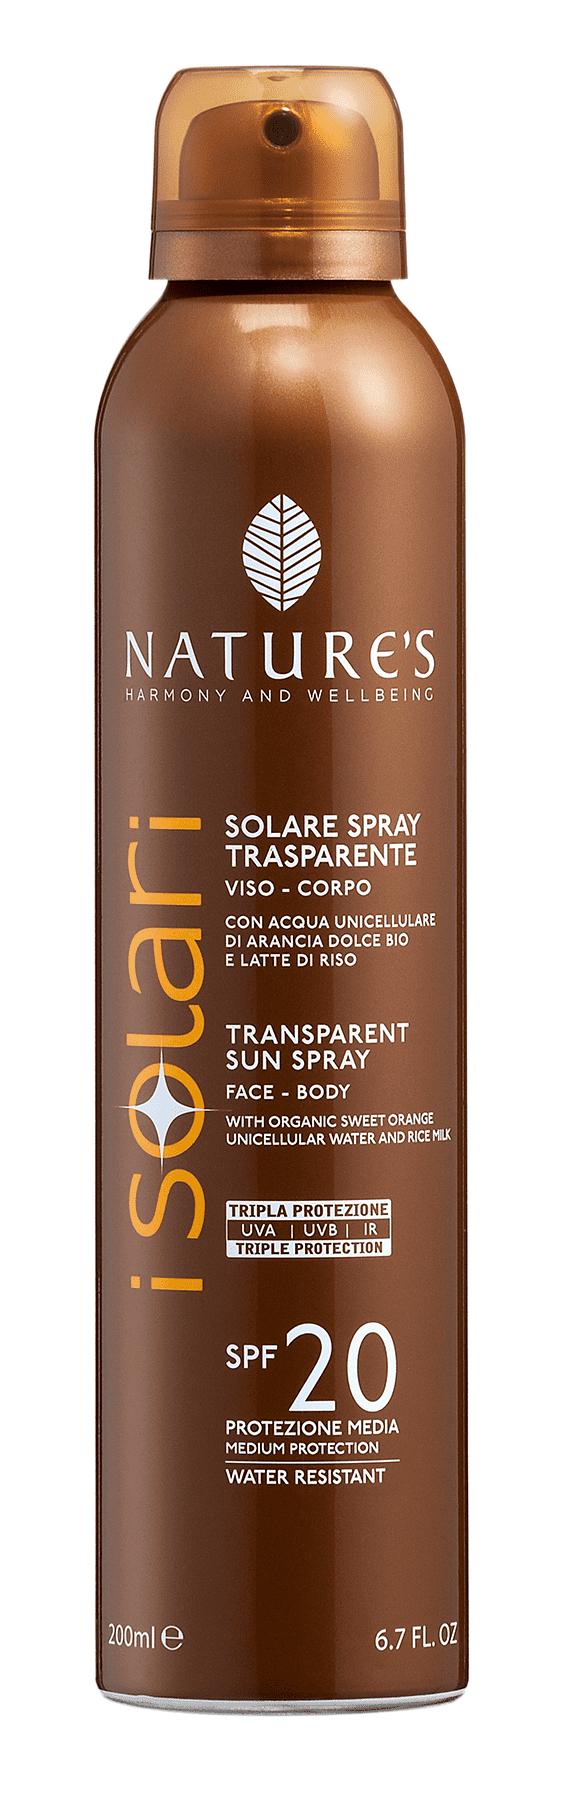 iSolari Solare spray trasparente Spf 20, Nature's